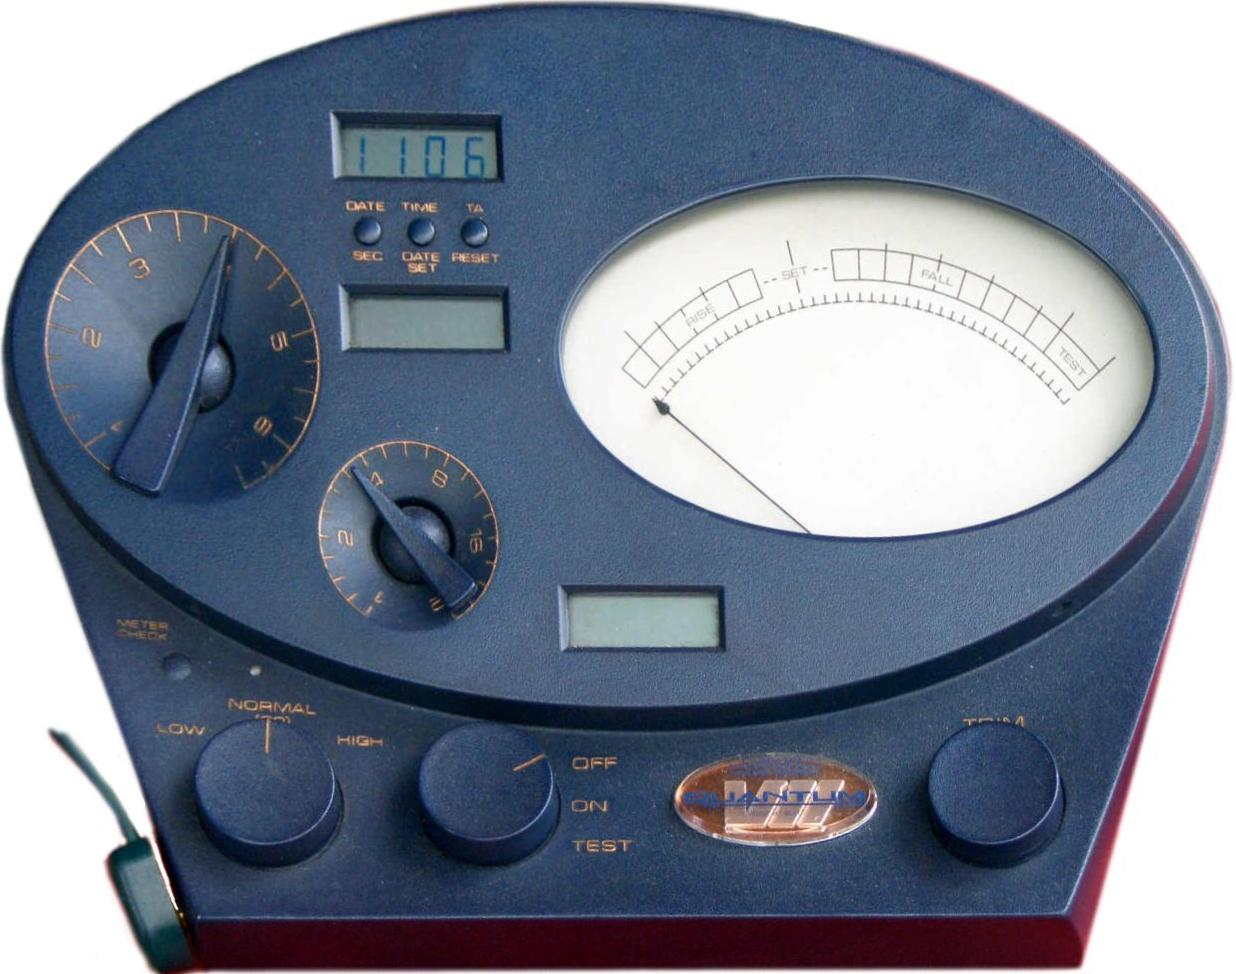 Scientology e-meter